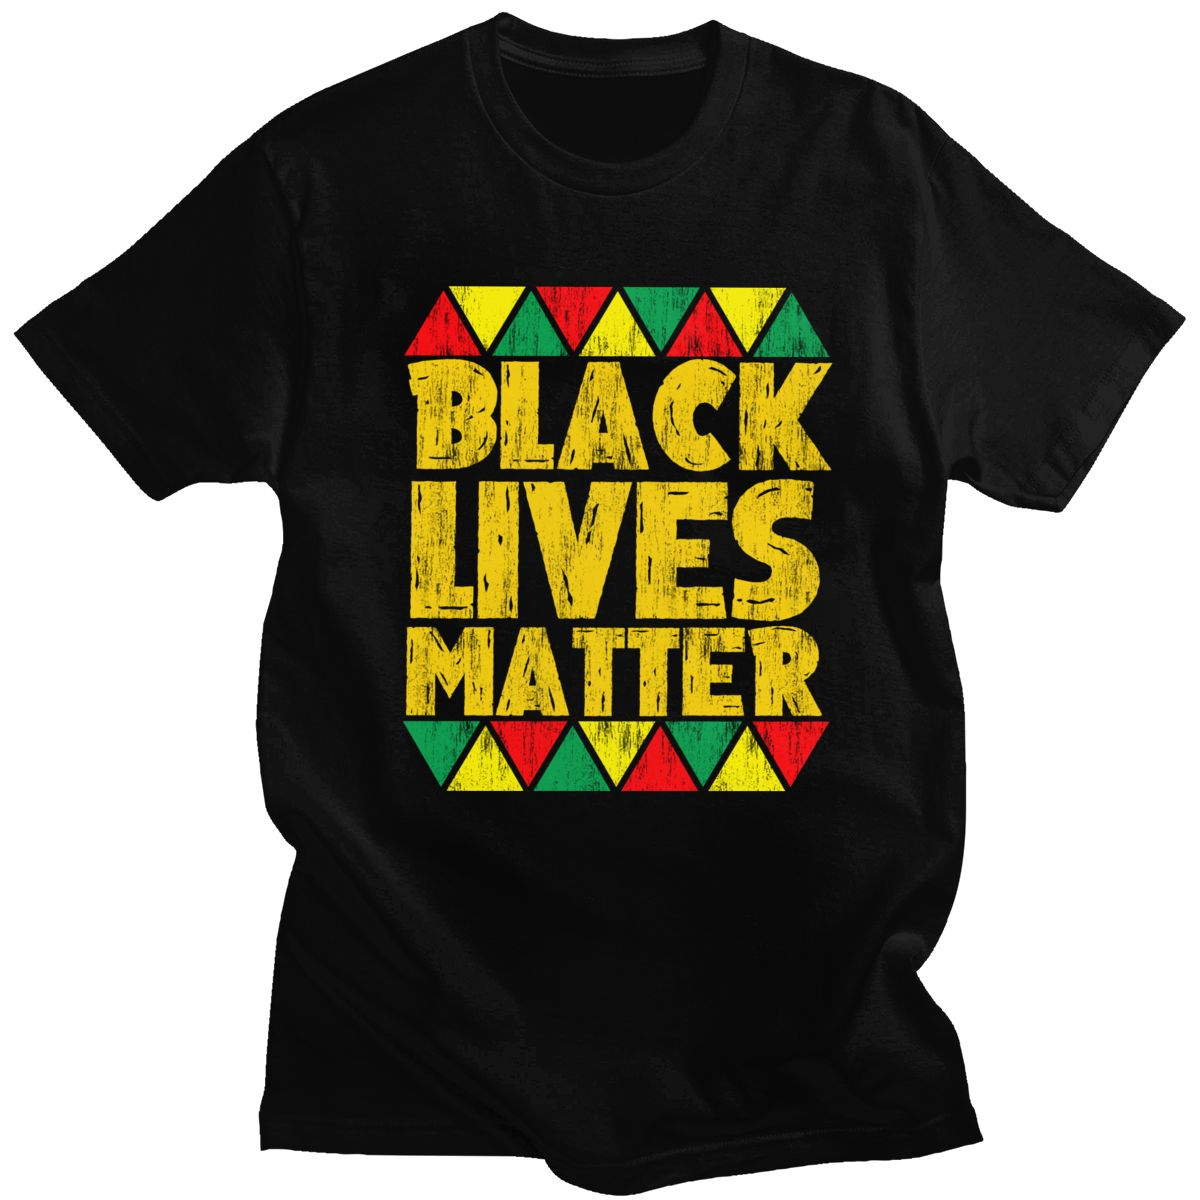 Camiseta clásica Vintage de Black Lives Matter de manga corta para hombre, Camiseta de algodón con cuello redondo, camiseta de ocio de orgullo africano americano BLM